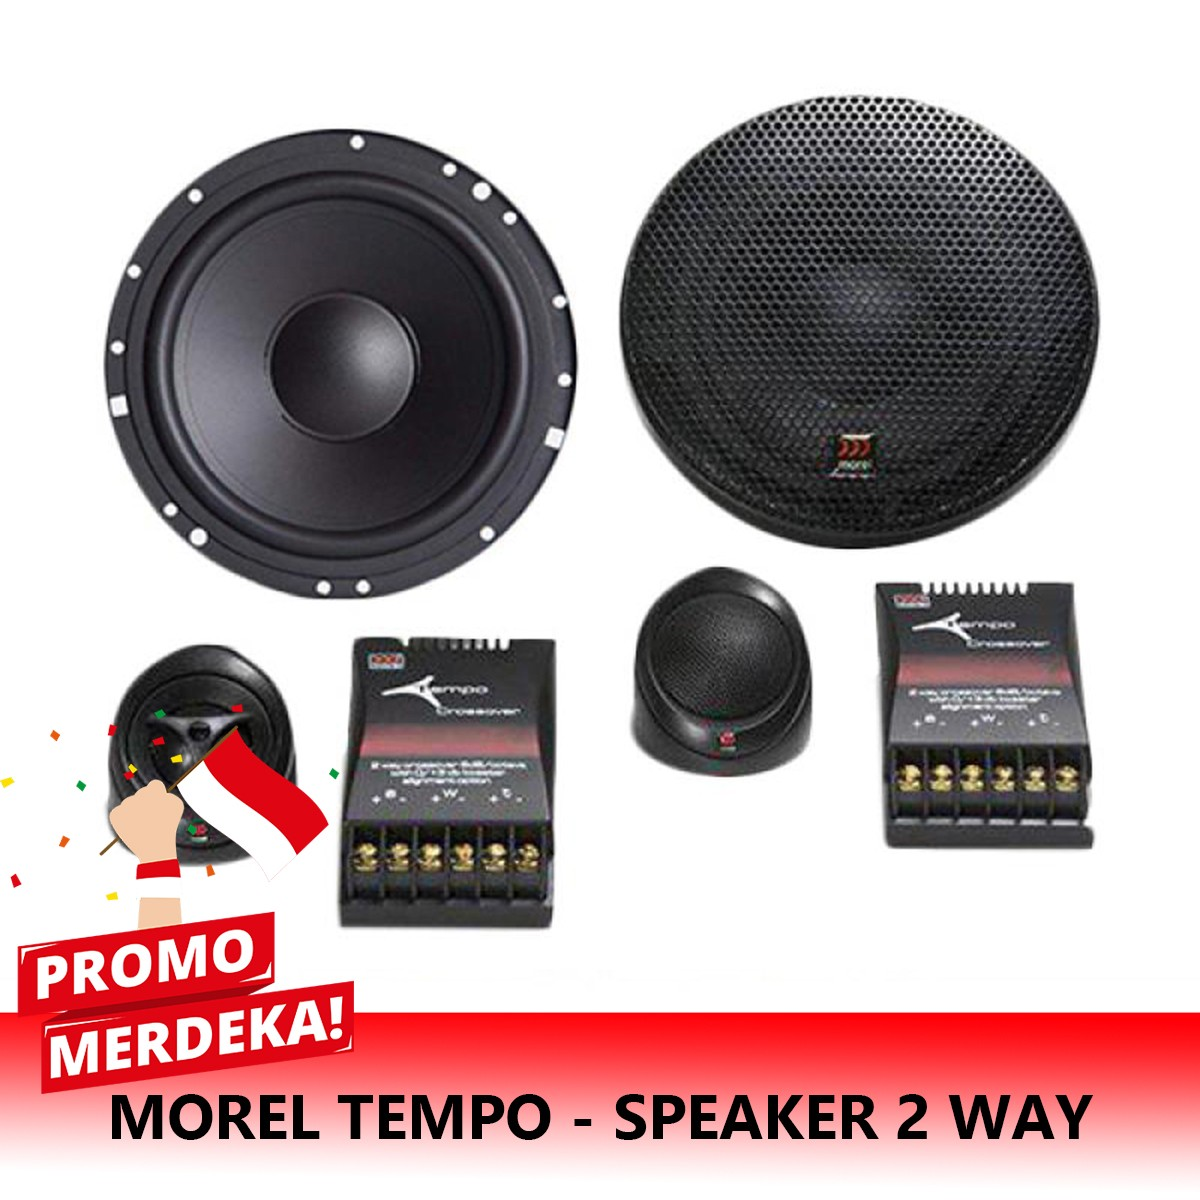 MERDEKA | SPECIAL MOREL TEMPO - SPEAKER 2 WAY